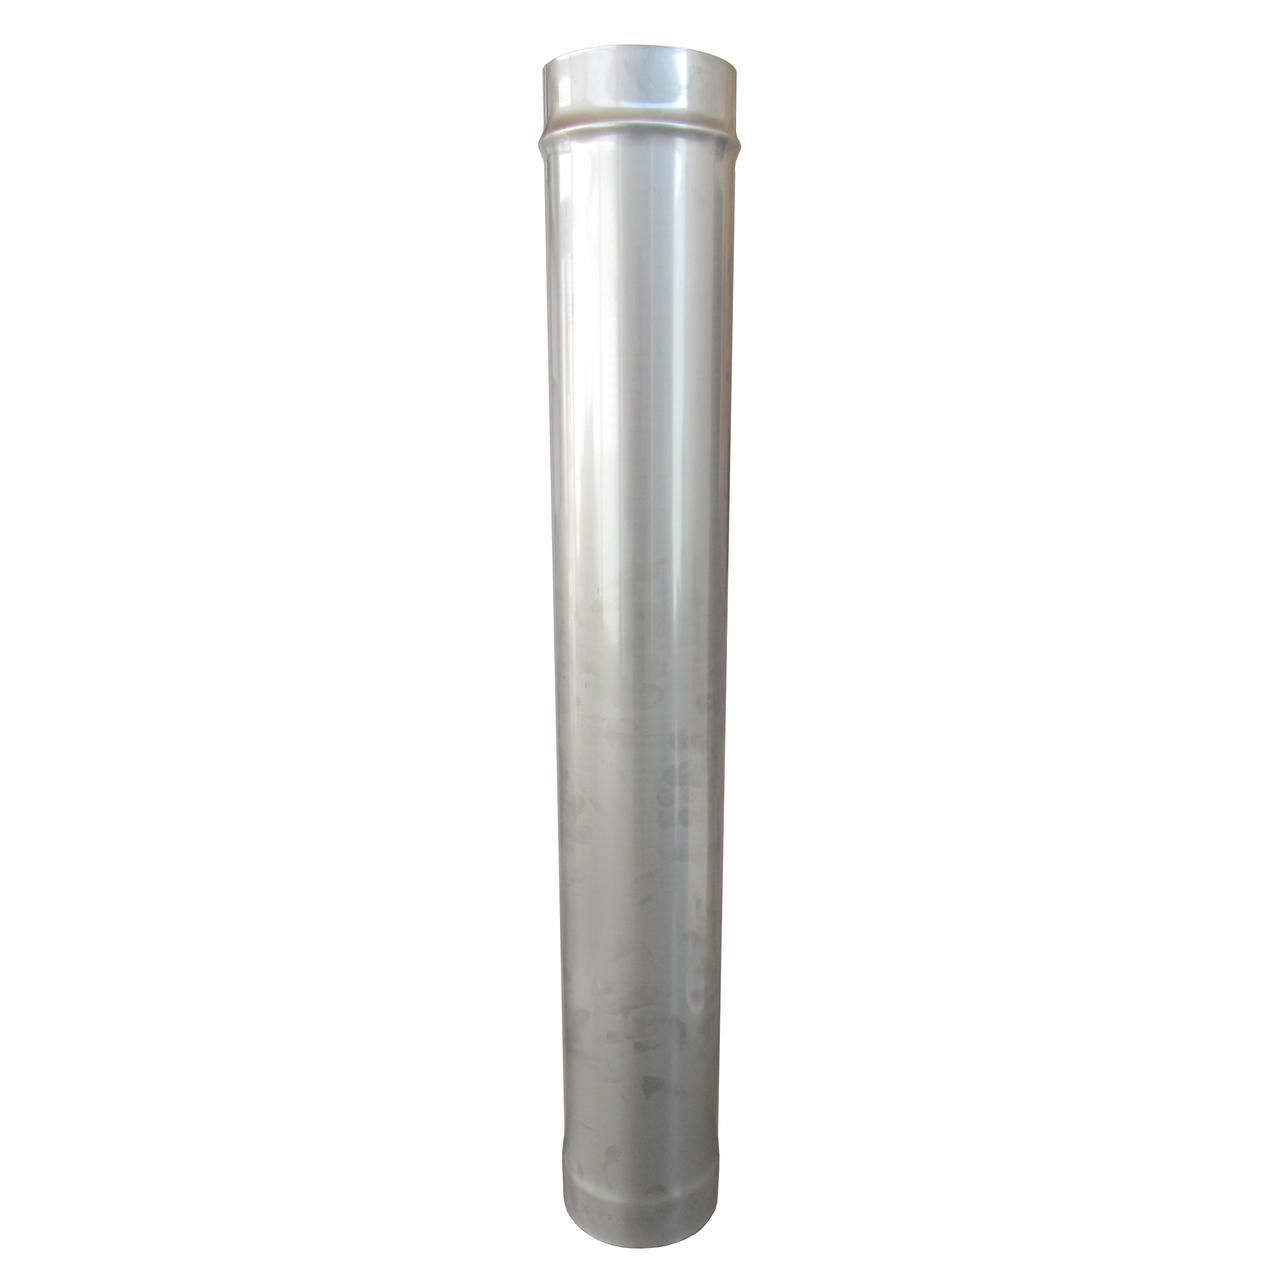 Труба ø150 мм 0,8 мм 1 метр AISI 321 Stalar дымоходная одностенная для дымохода бани сауны из нержавеющей стал